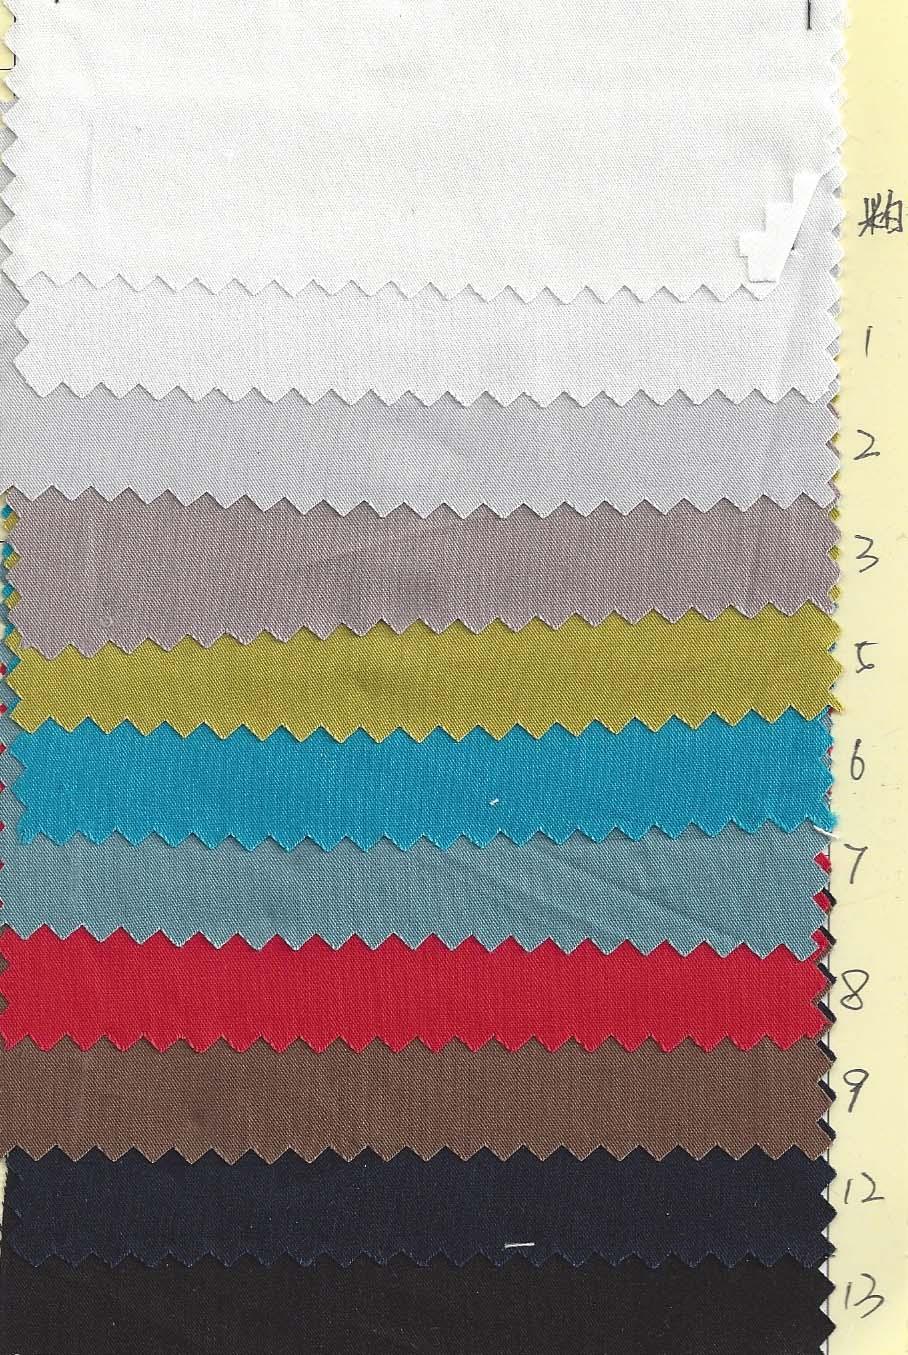 Hong Zhan Textile 725.jpg